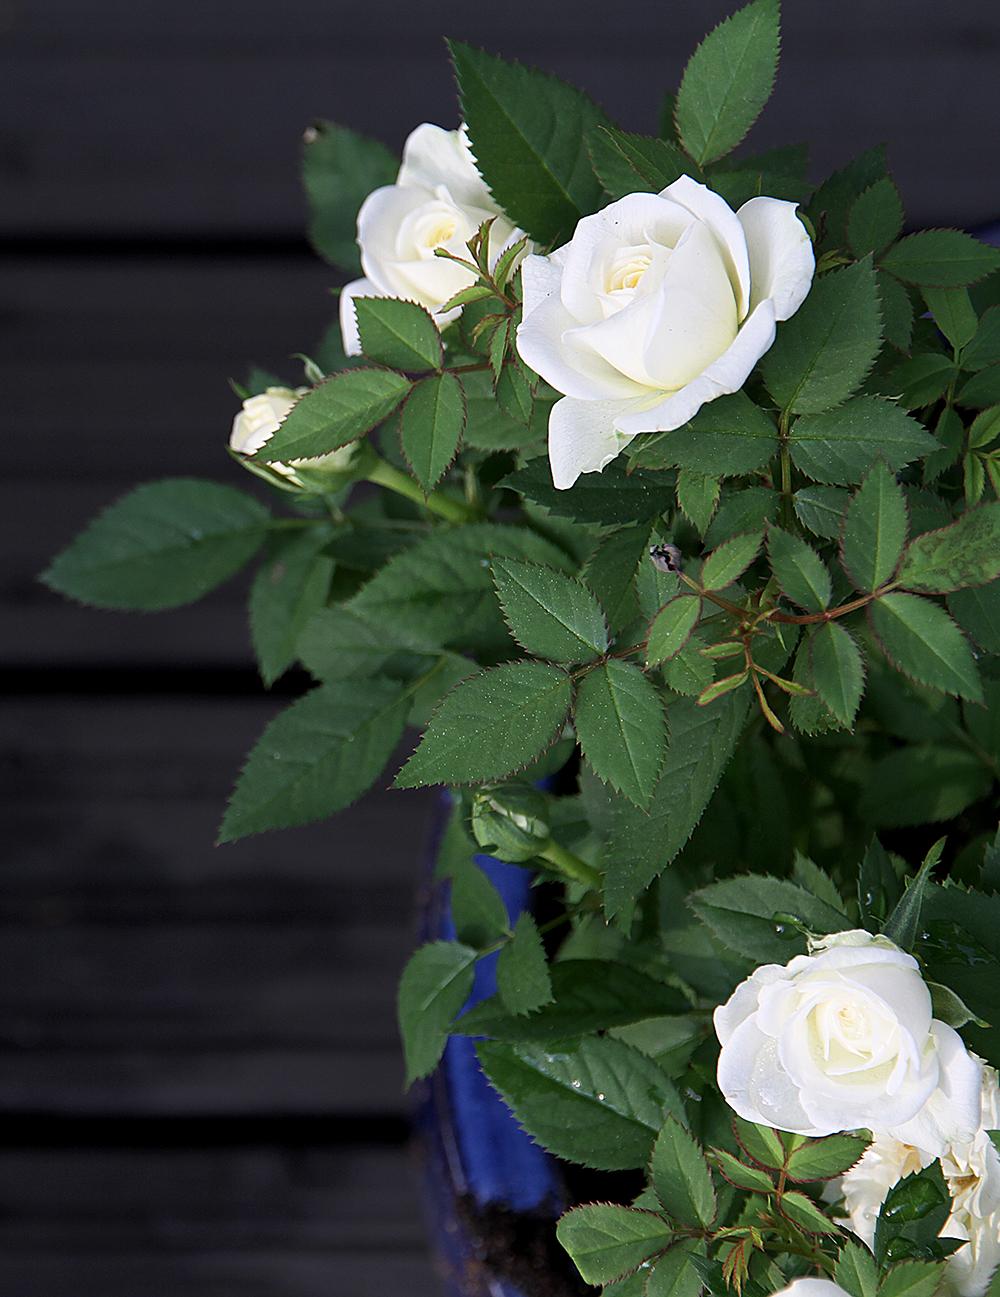 hunajaista ruusu takapiha terassi puutarha